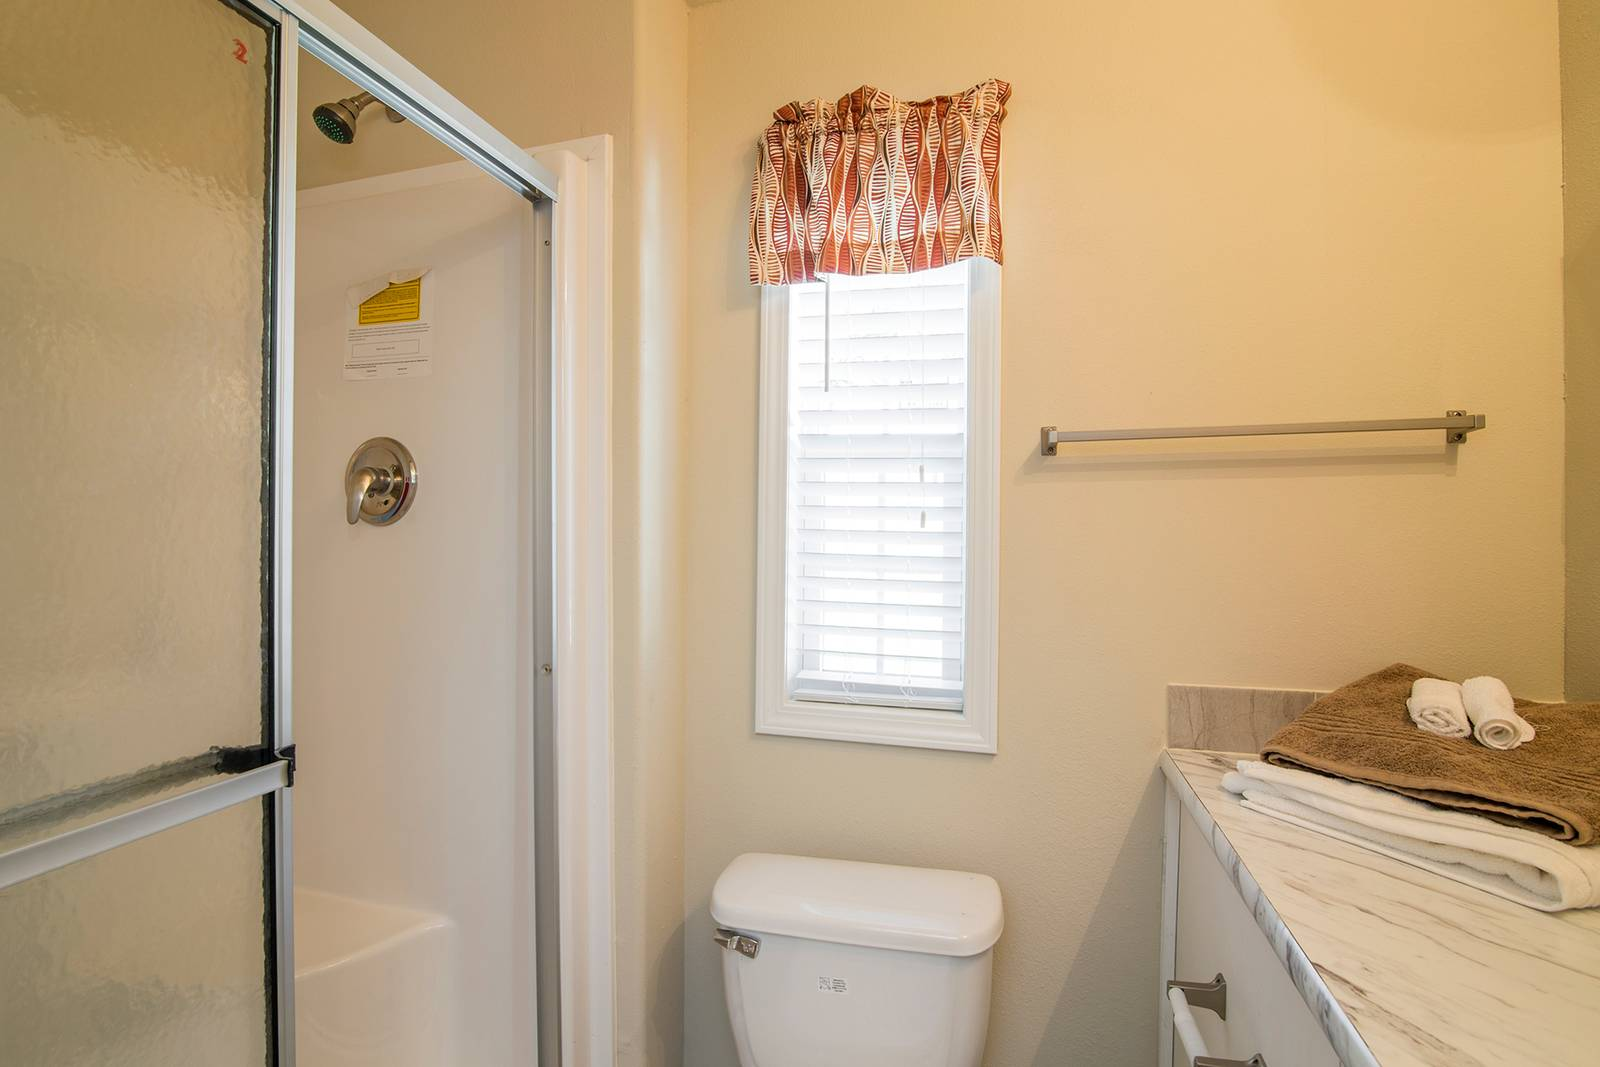 Park Model RV / APH 517A - Bathroom